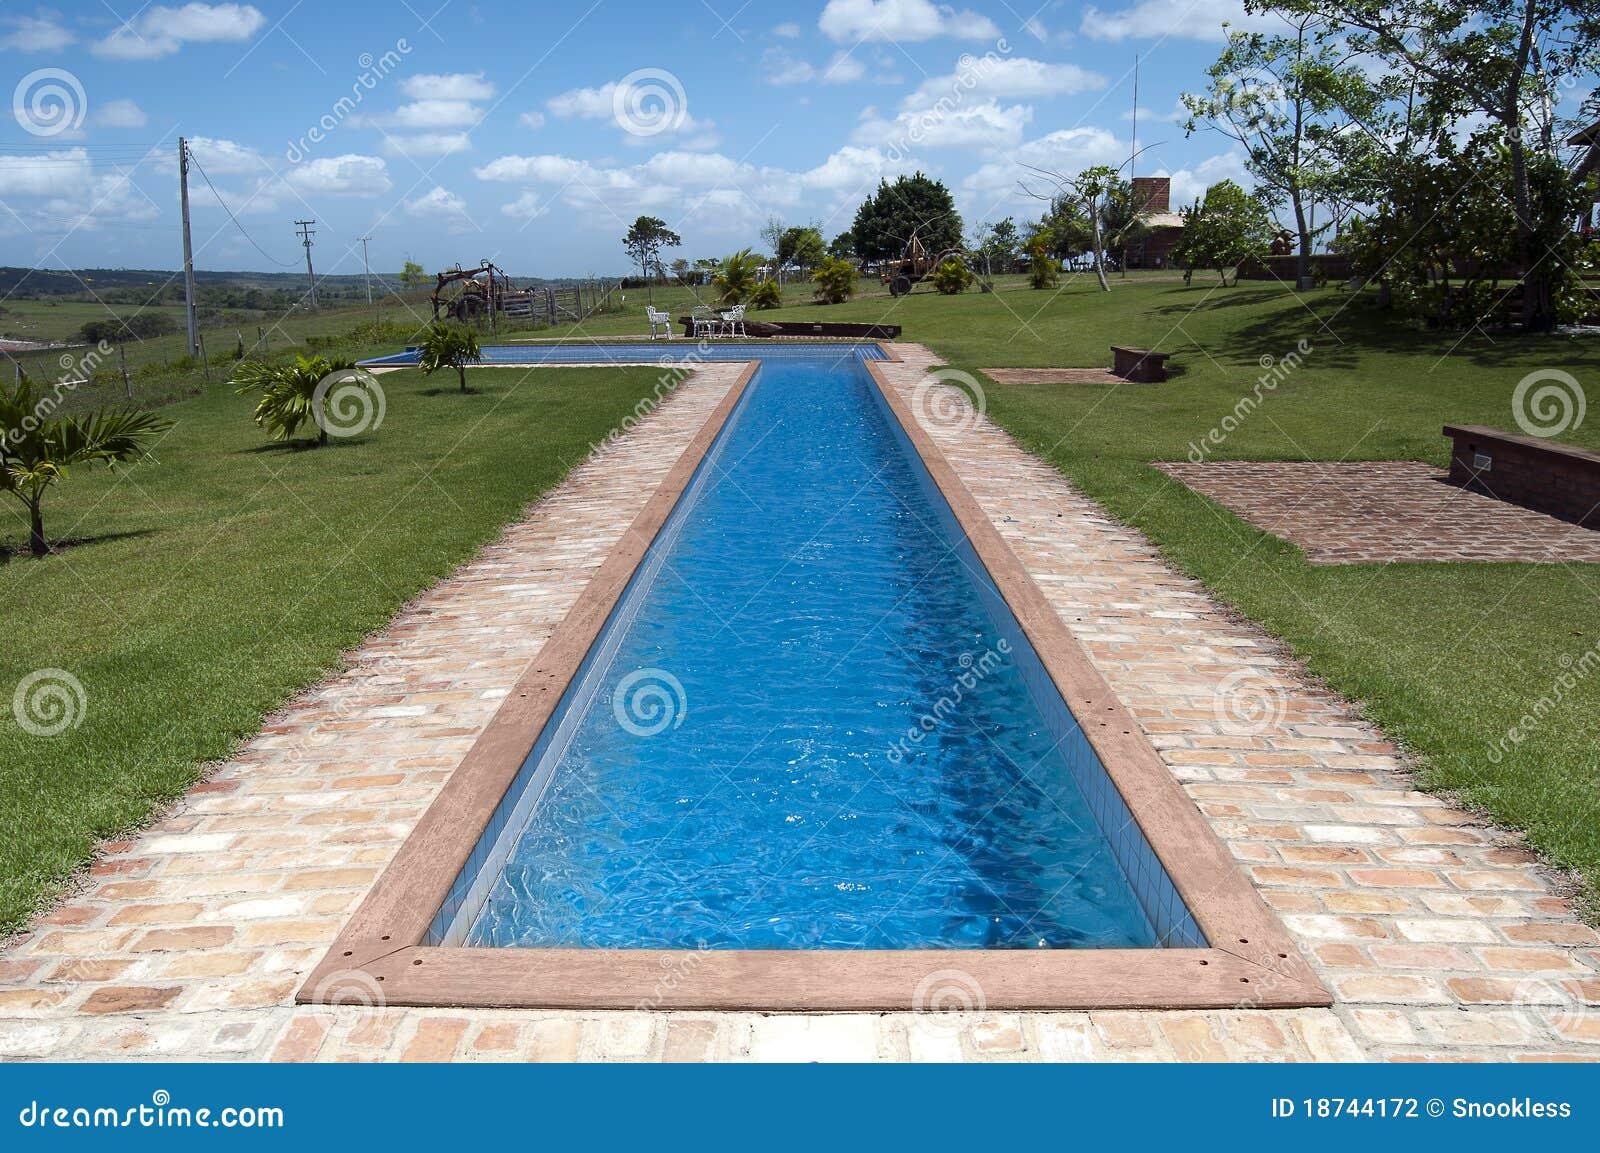 Swimming Pool Stock Photography - Image: 18744172